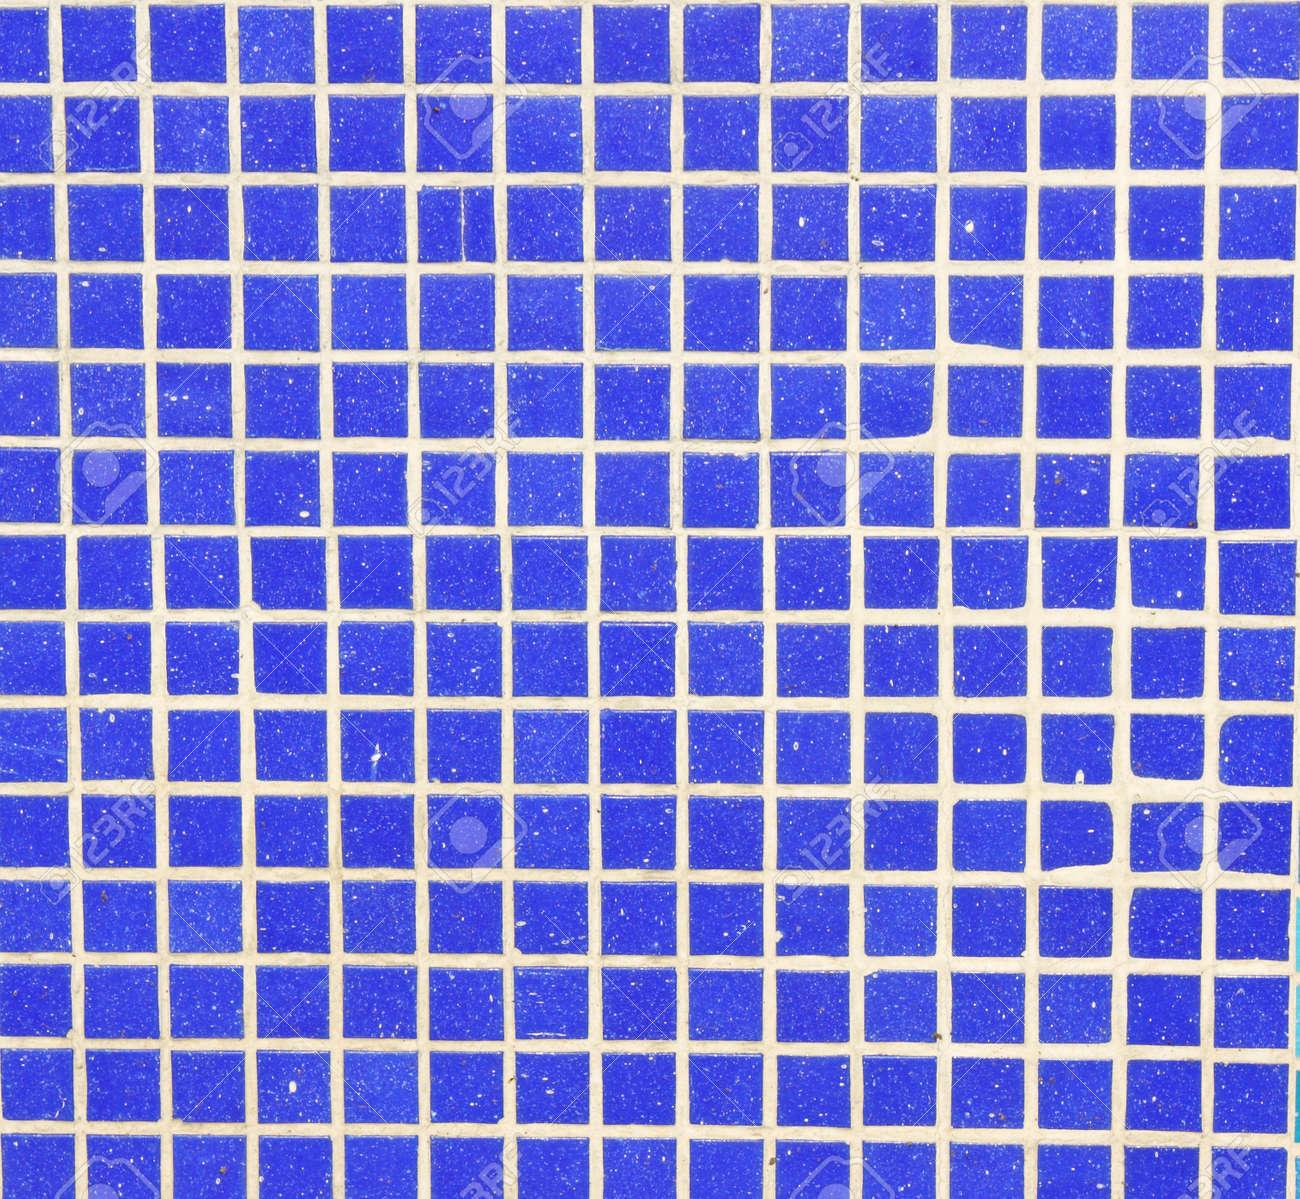 Blue Bathroom Tile Texture wall tile texture - creditrestore